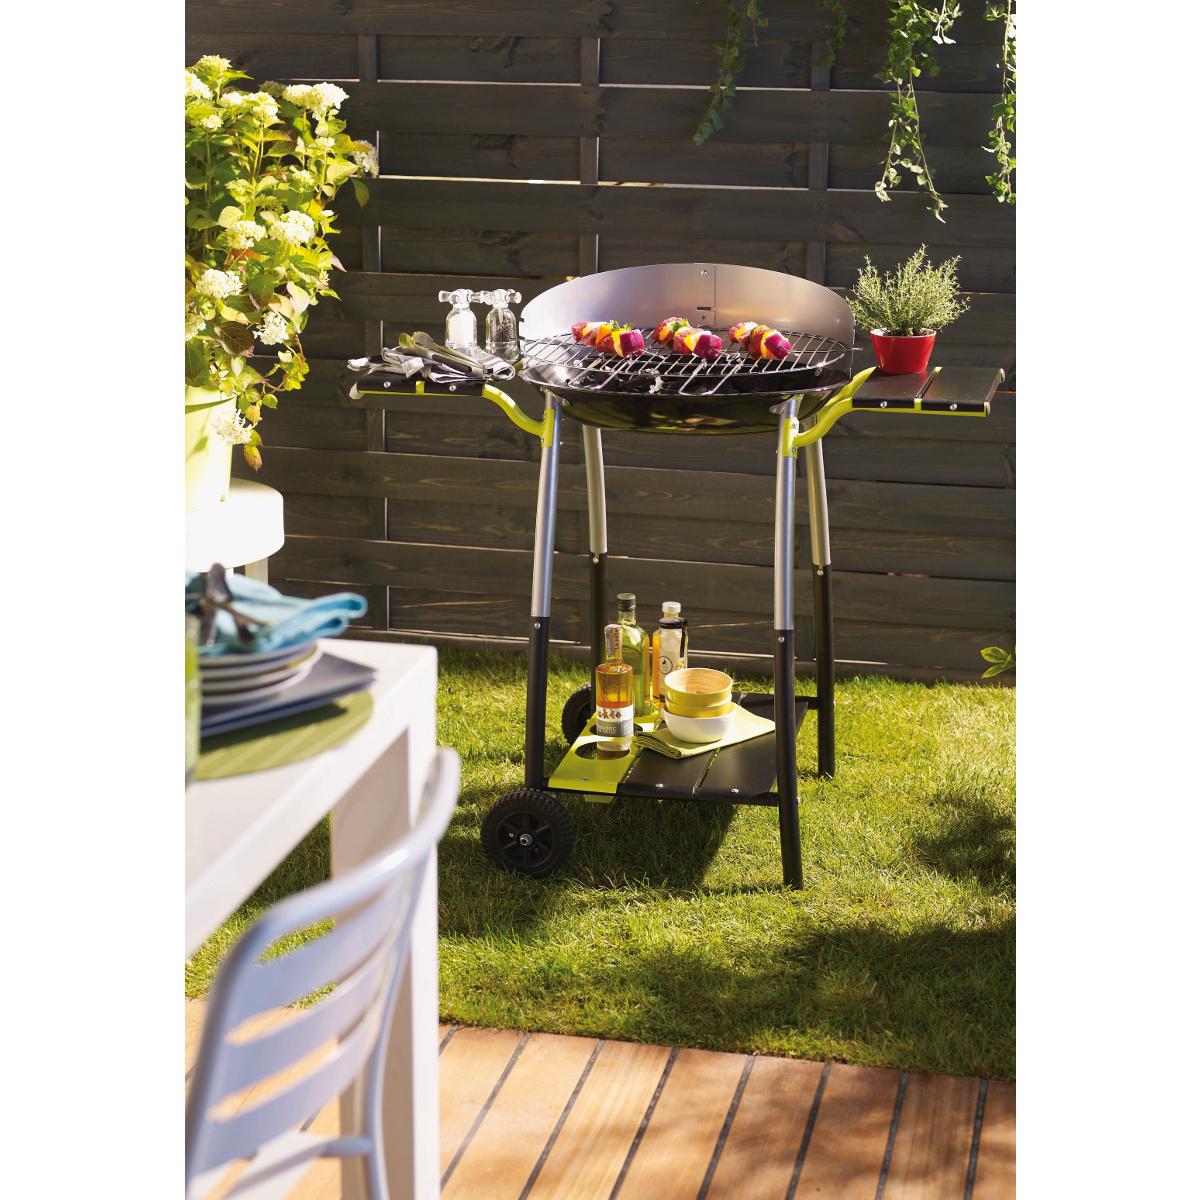 Barbecue curvi xl cookin garden for Barbecue de jardin